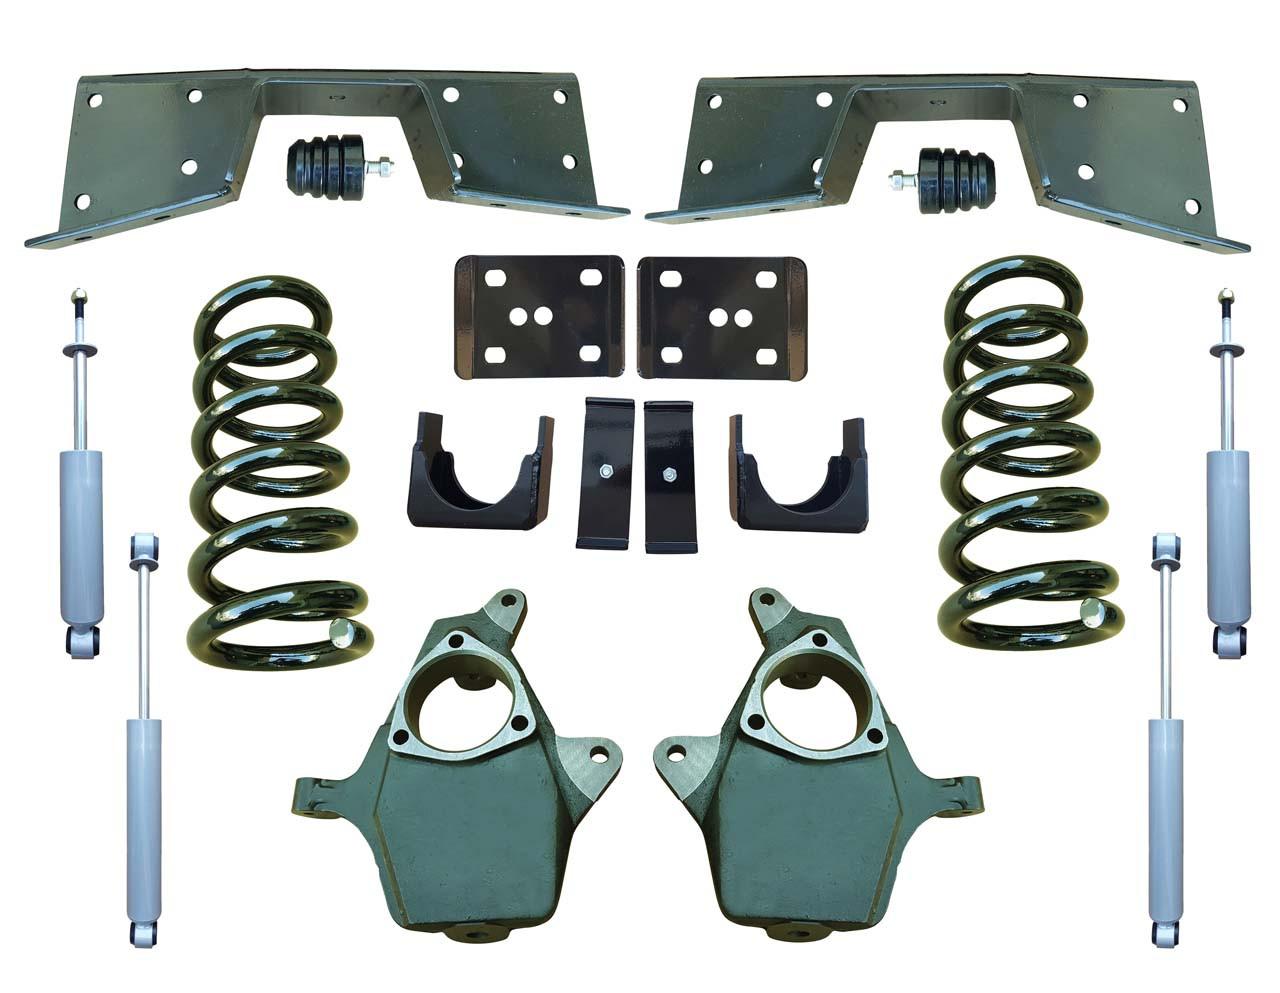 Complete 4/6 Lowering Kit for 99-00 Chevrolet Silverado